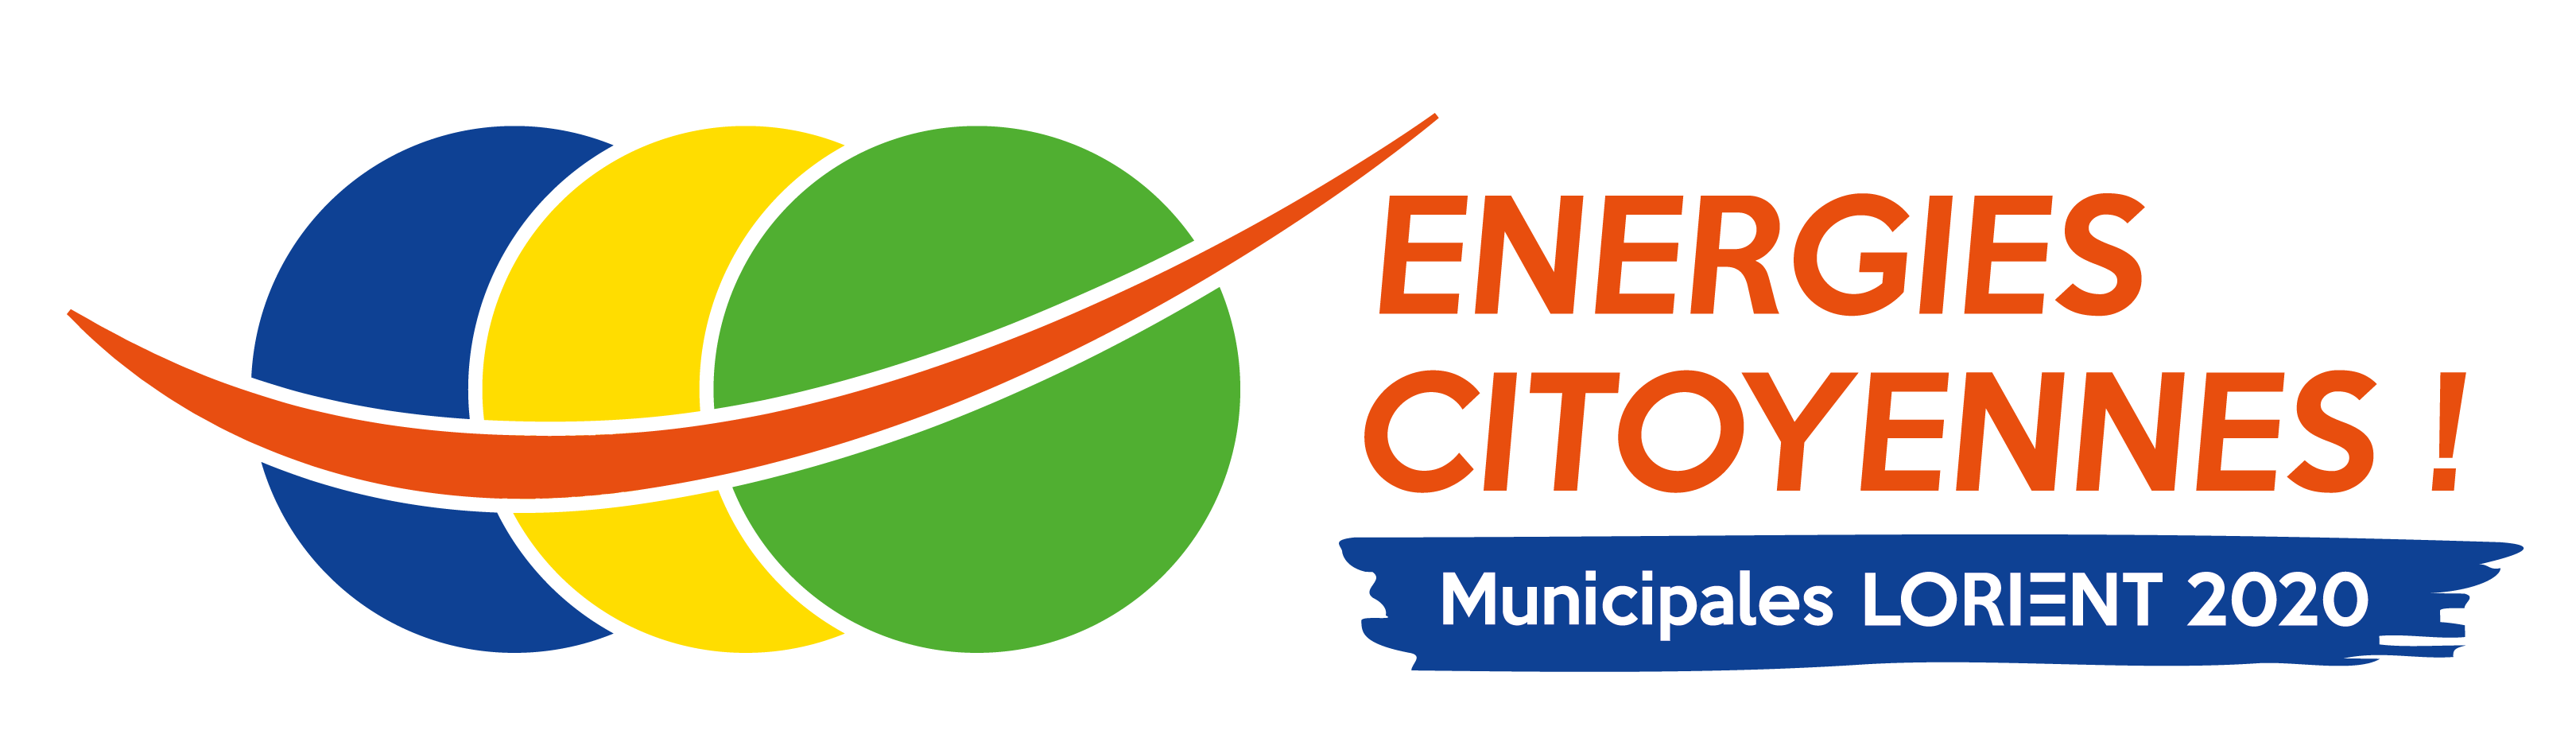 Énergies Citoyennes Lorient